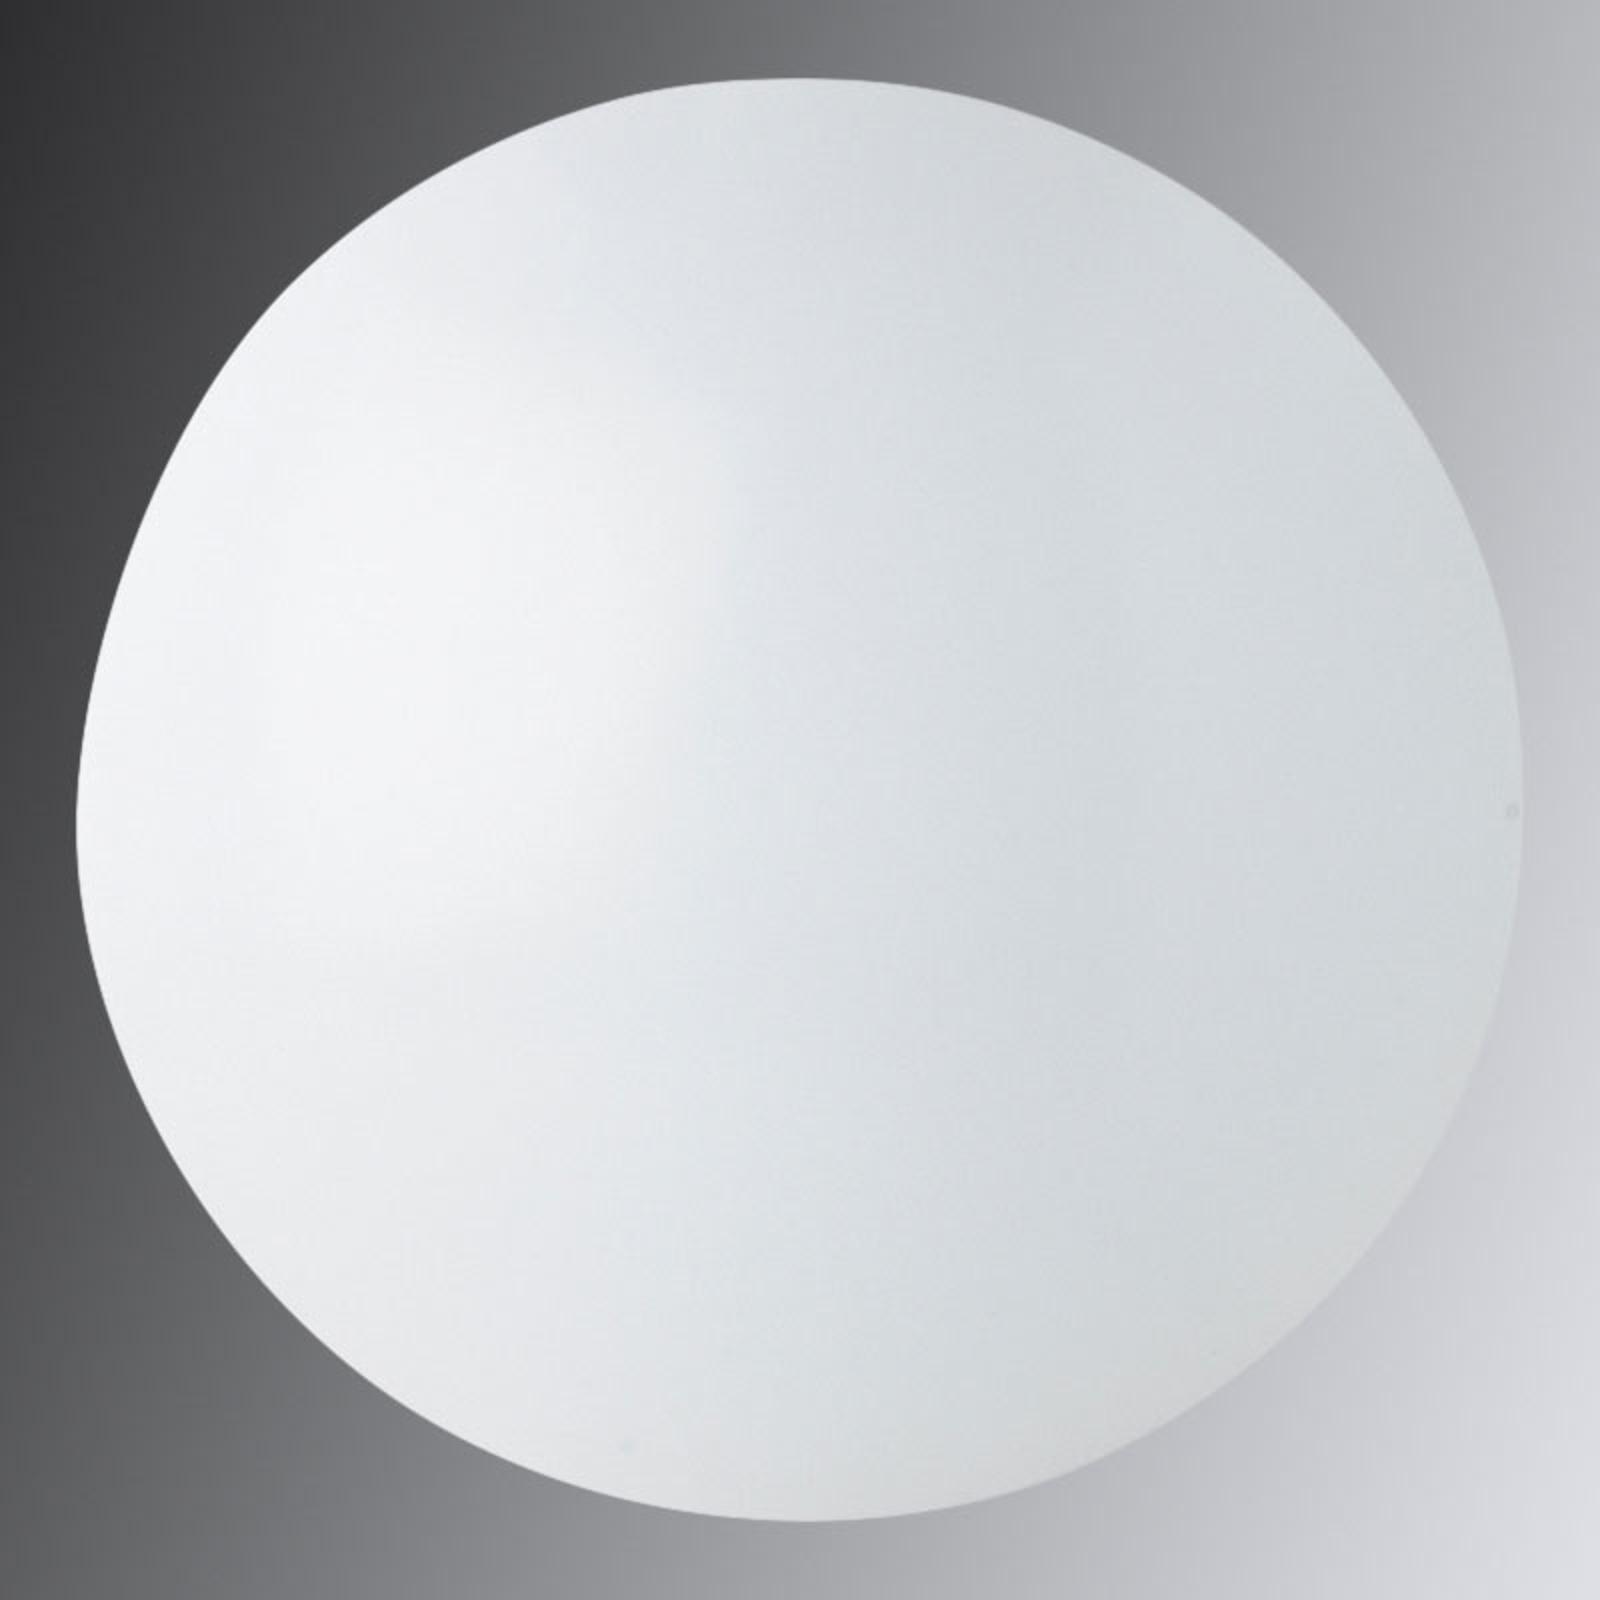 Tehokas LED-kattovalaisin Renzo, 31,5 W, 4 000 K